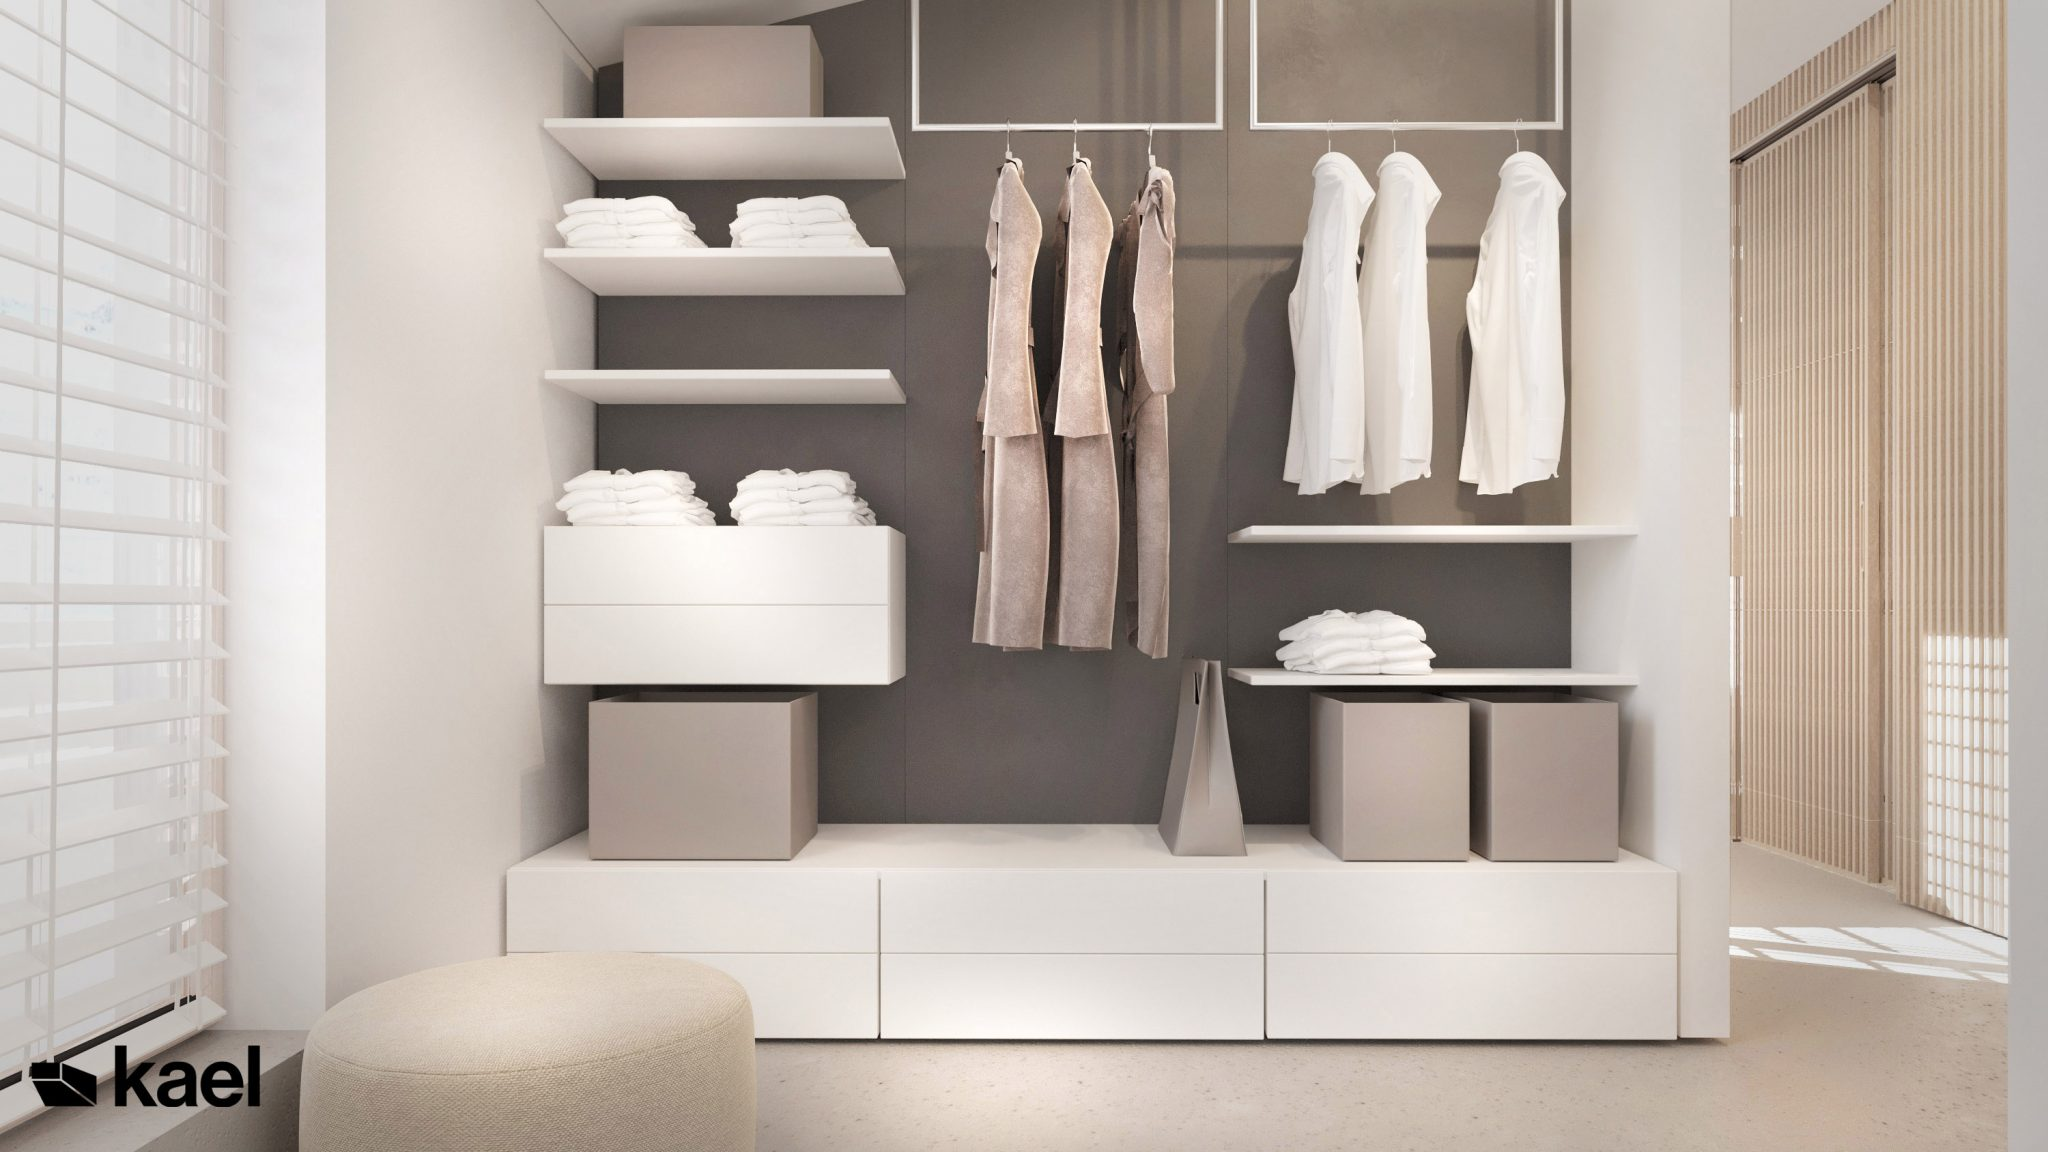 Garderoba - Palestera - projekt wnętrza Kael